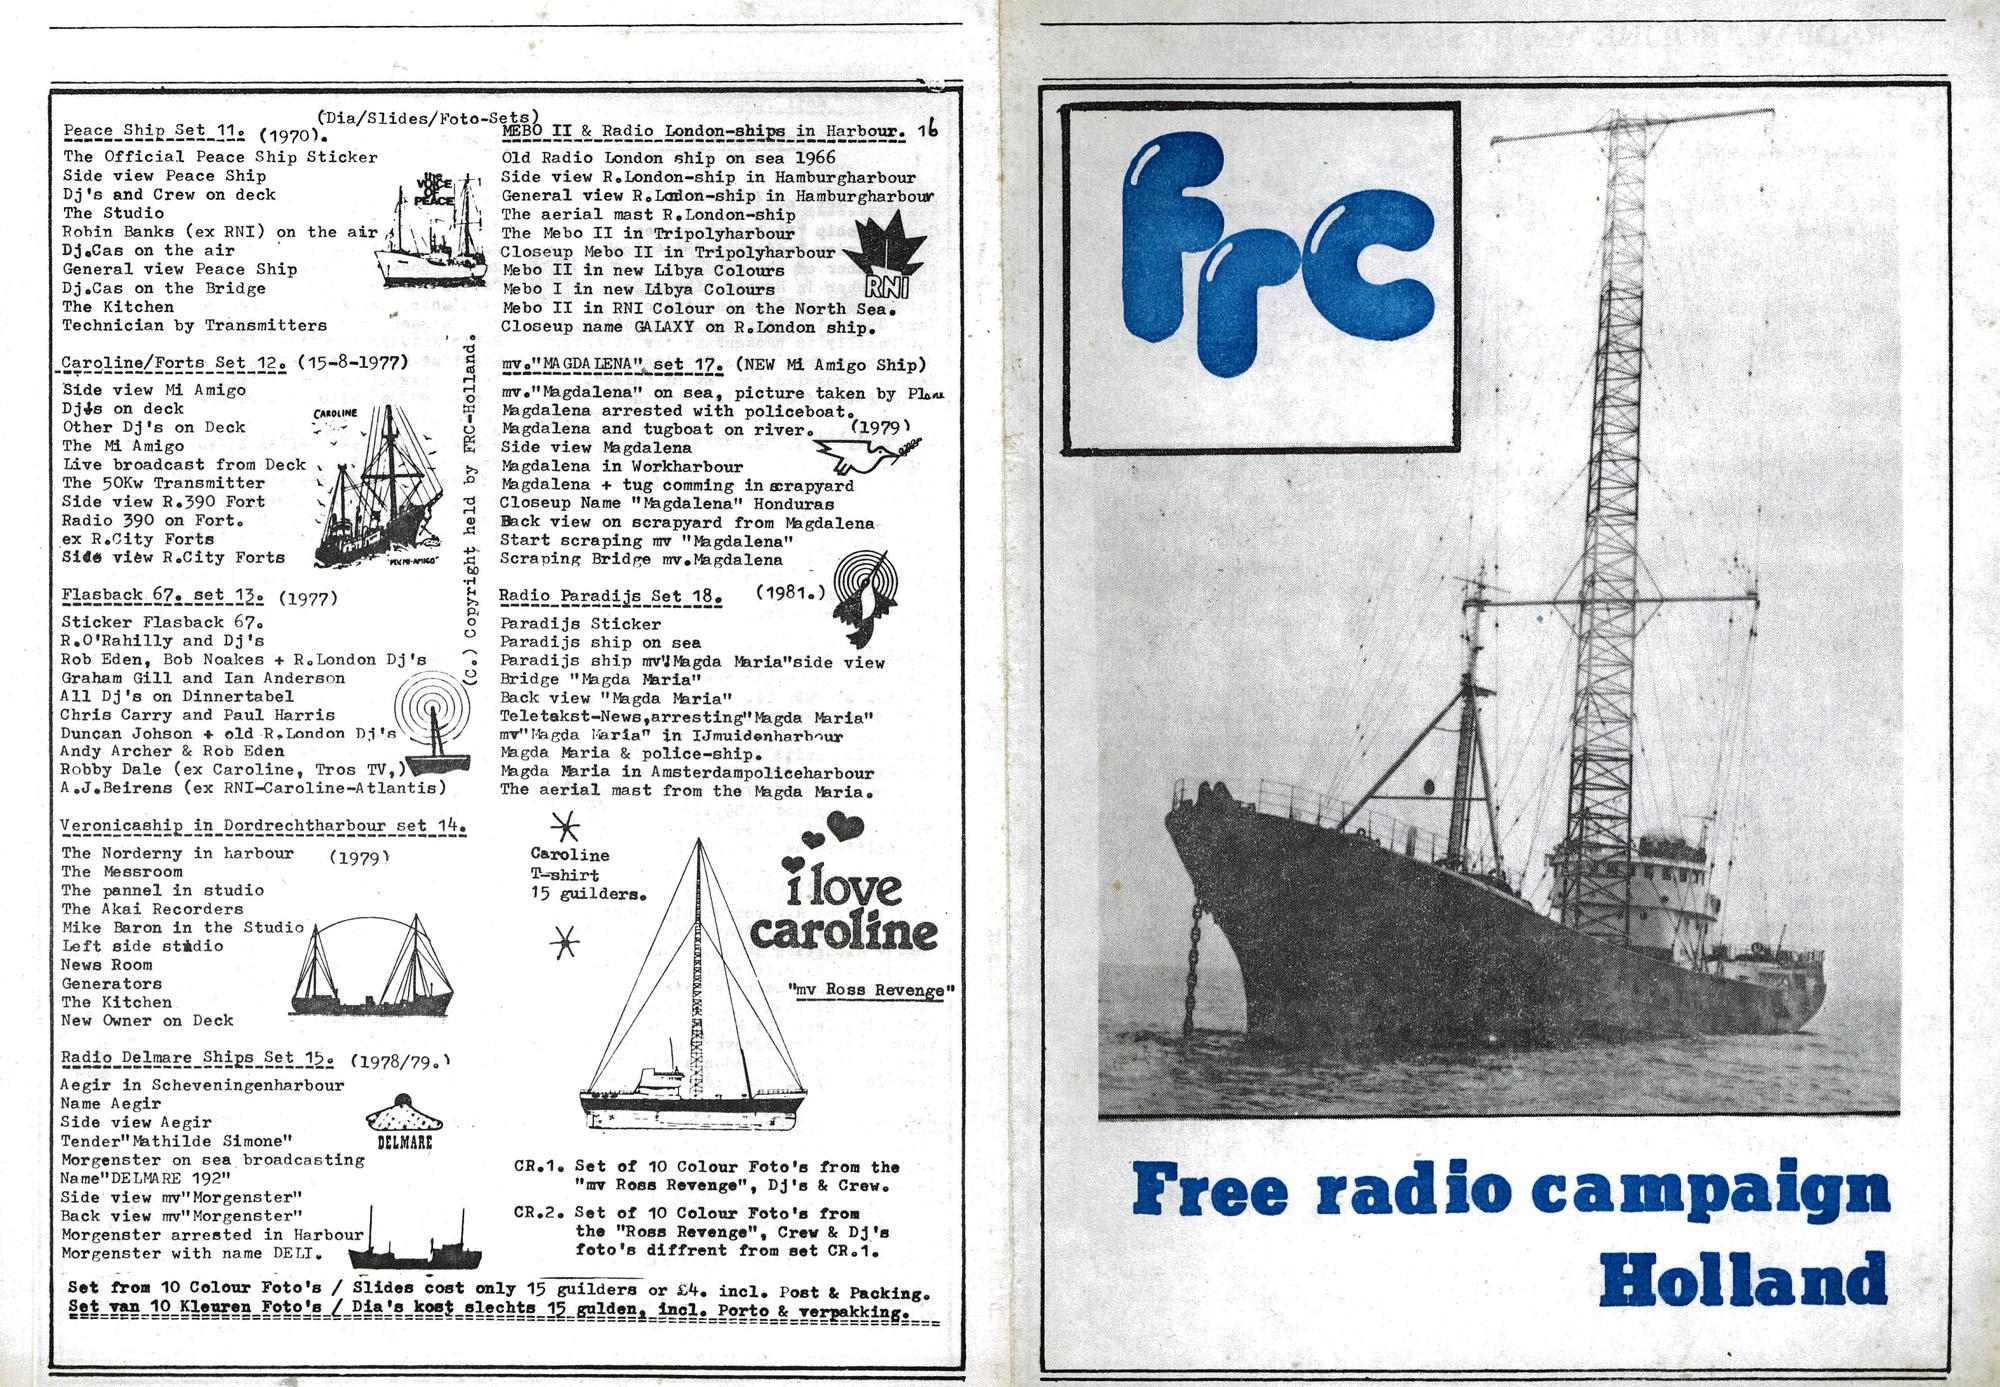 FRC_Holland01.jpg